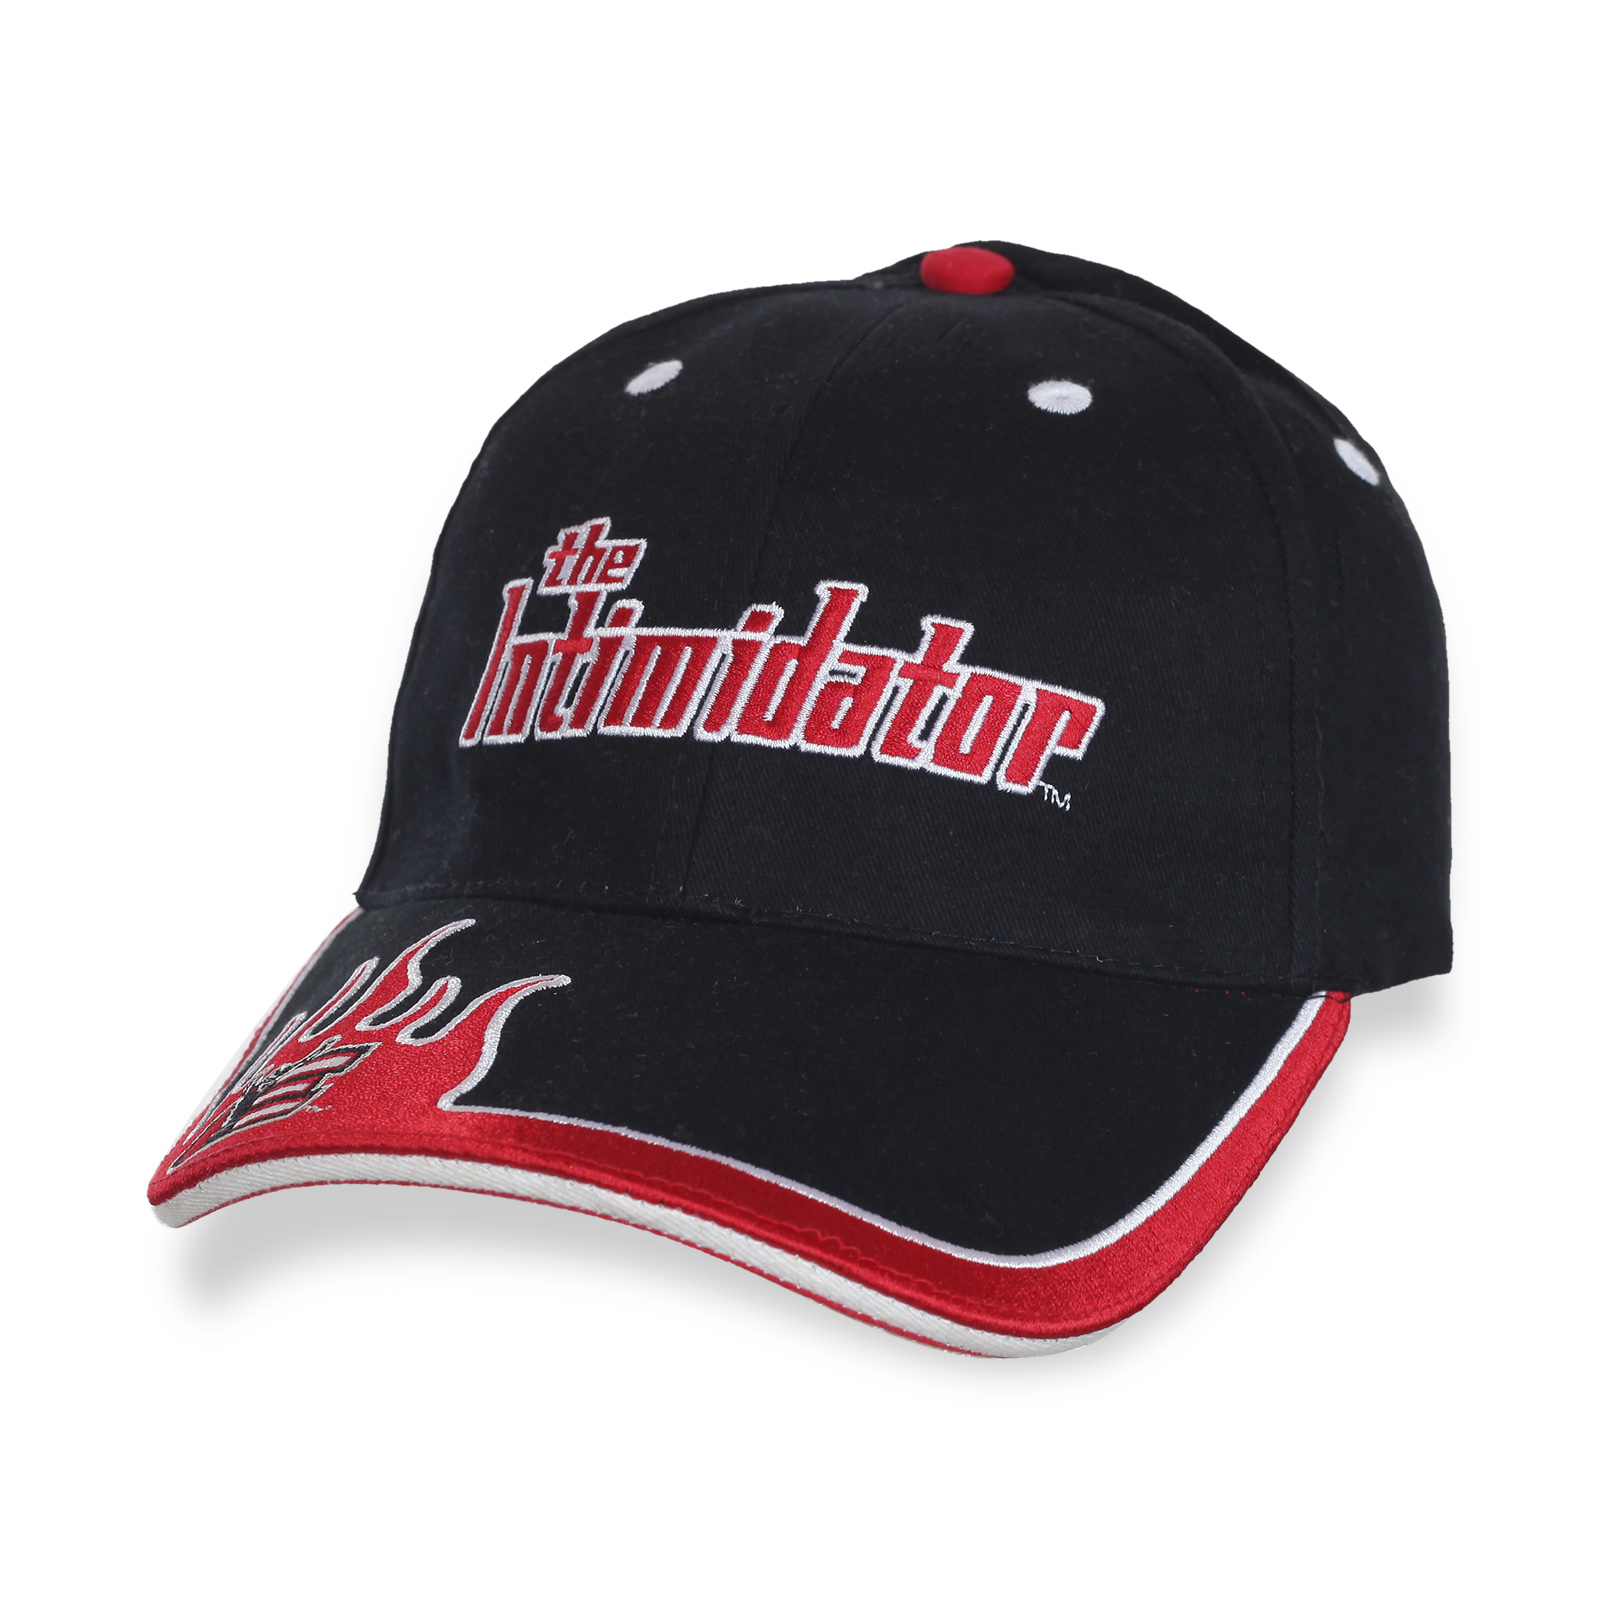 Строгая бейсболка thi Intimidator™